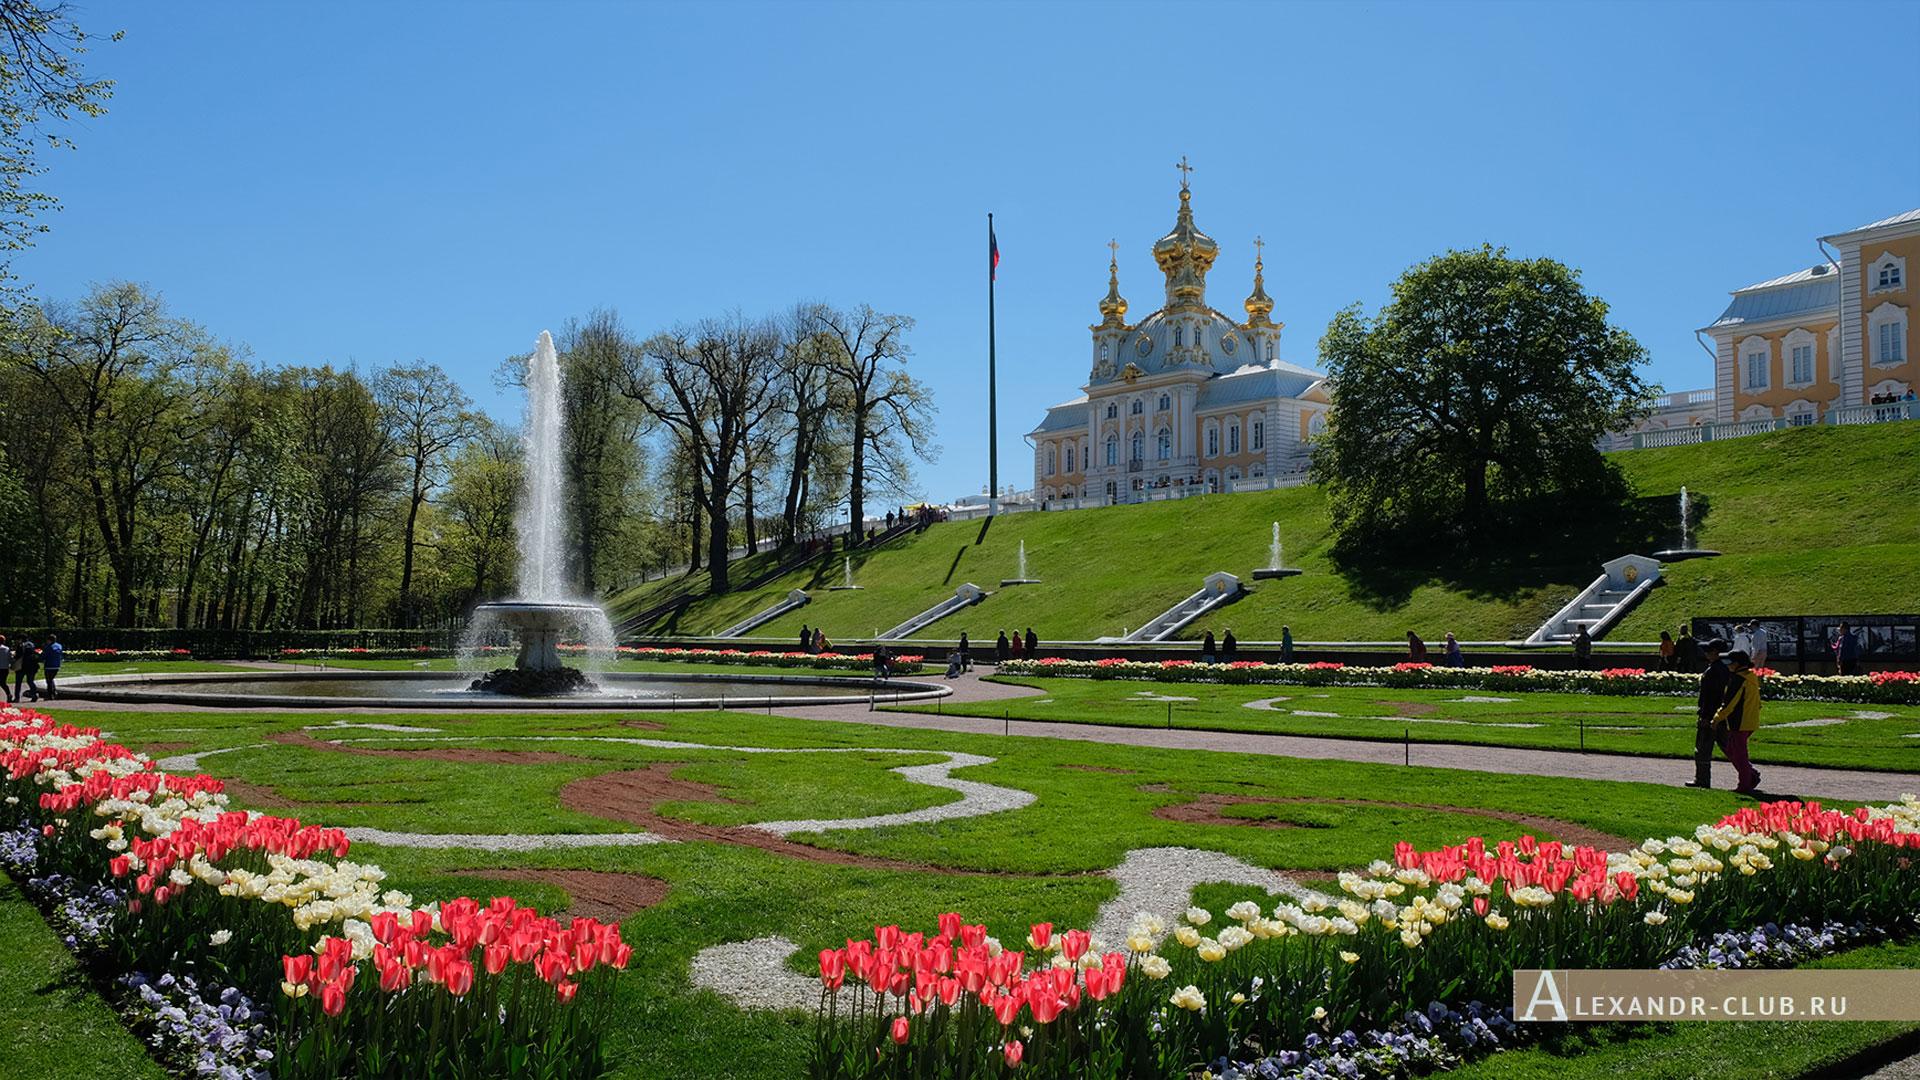 Петергоф, весна, Нижний парк, фонтан «Чаша», Церковный корпус Большого дворца